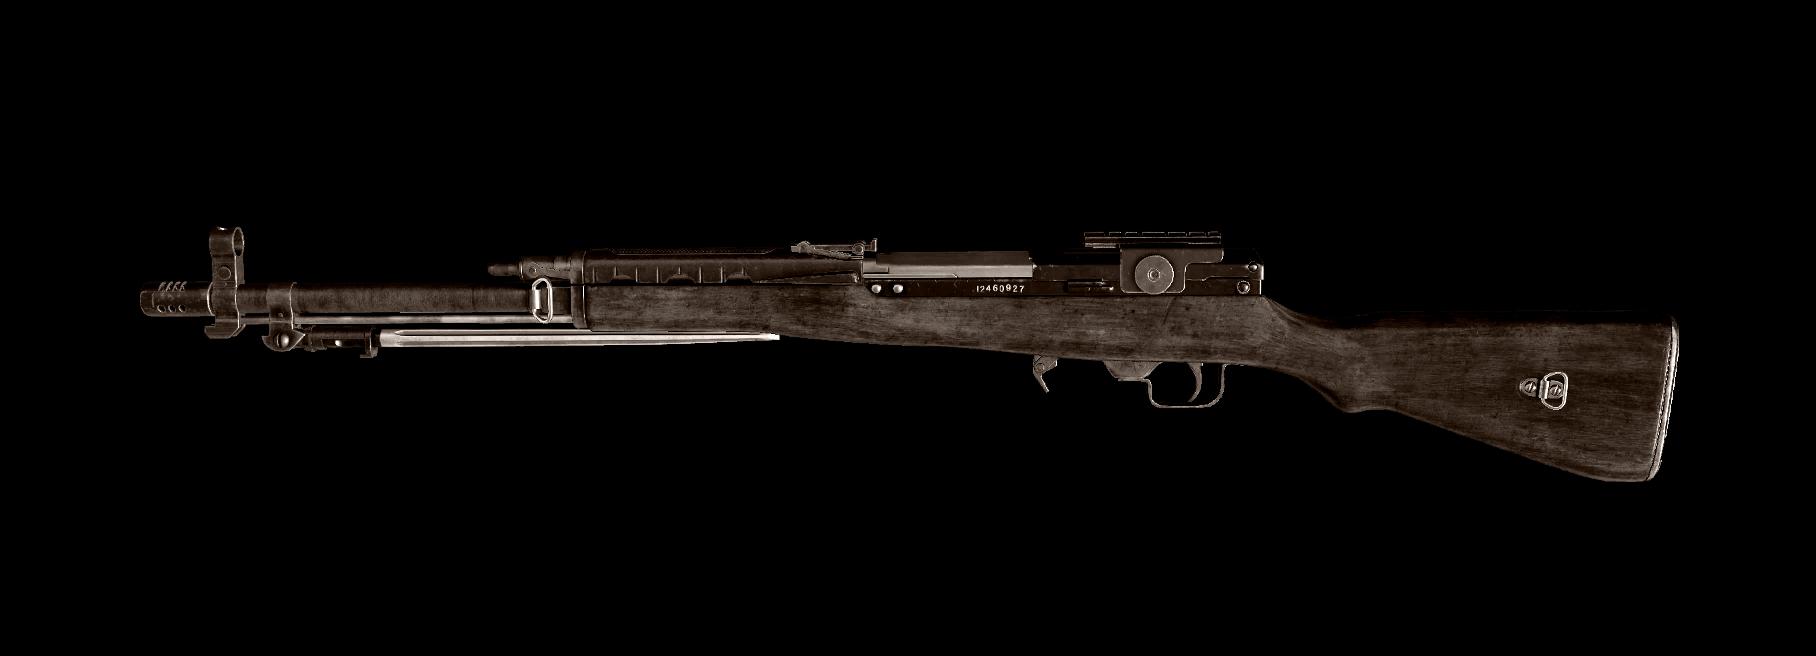 Type 63 Image